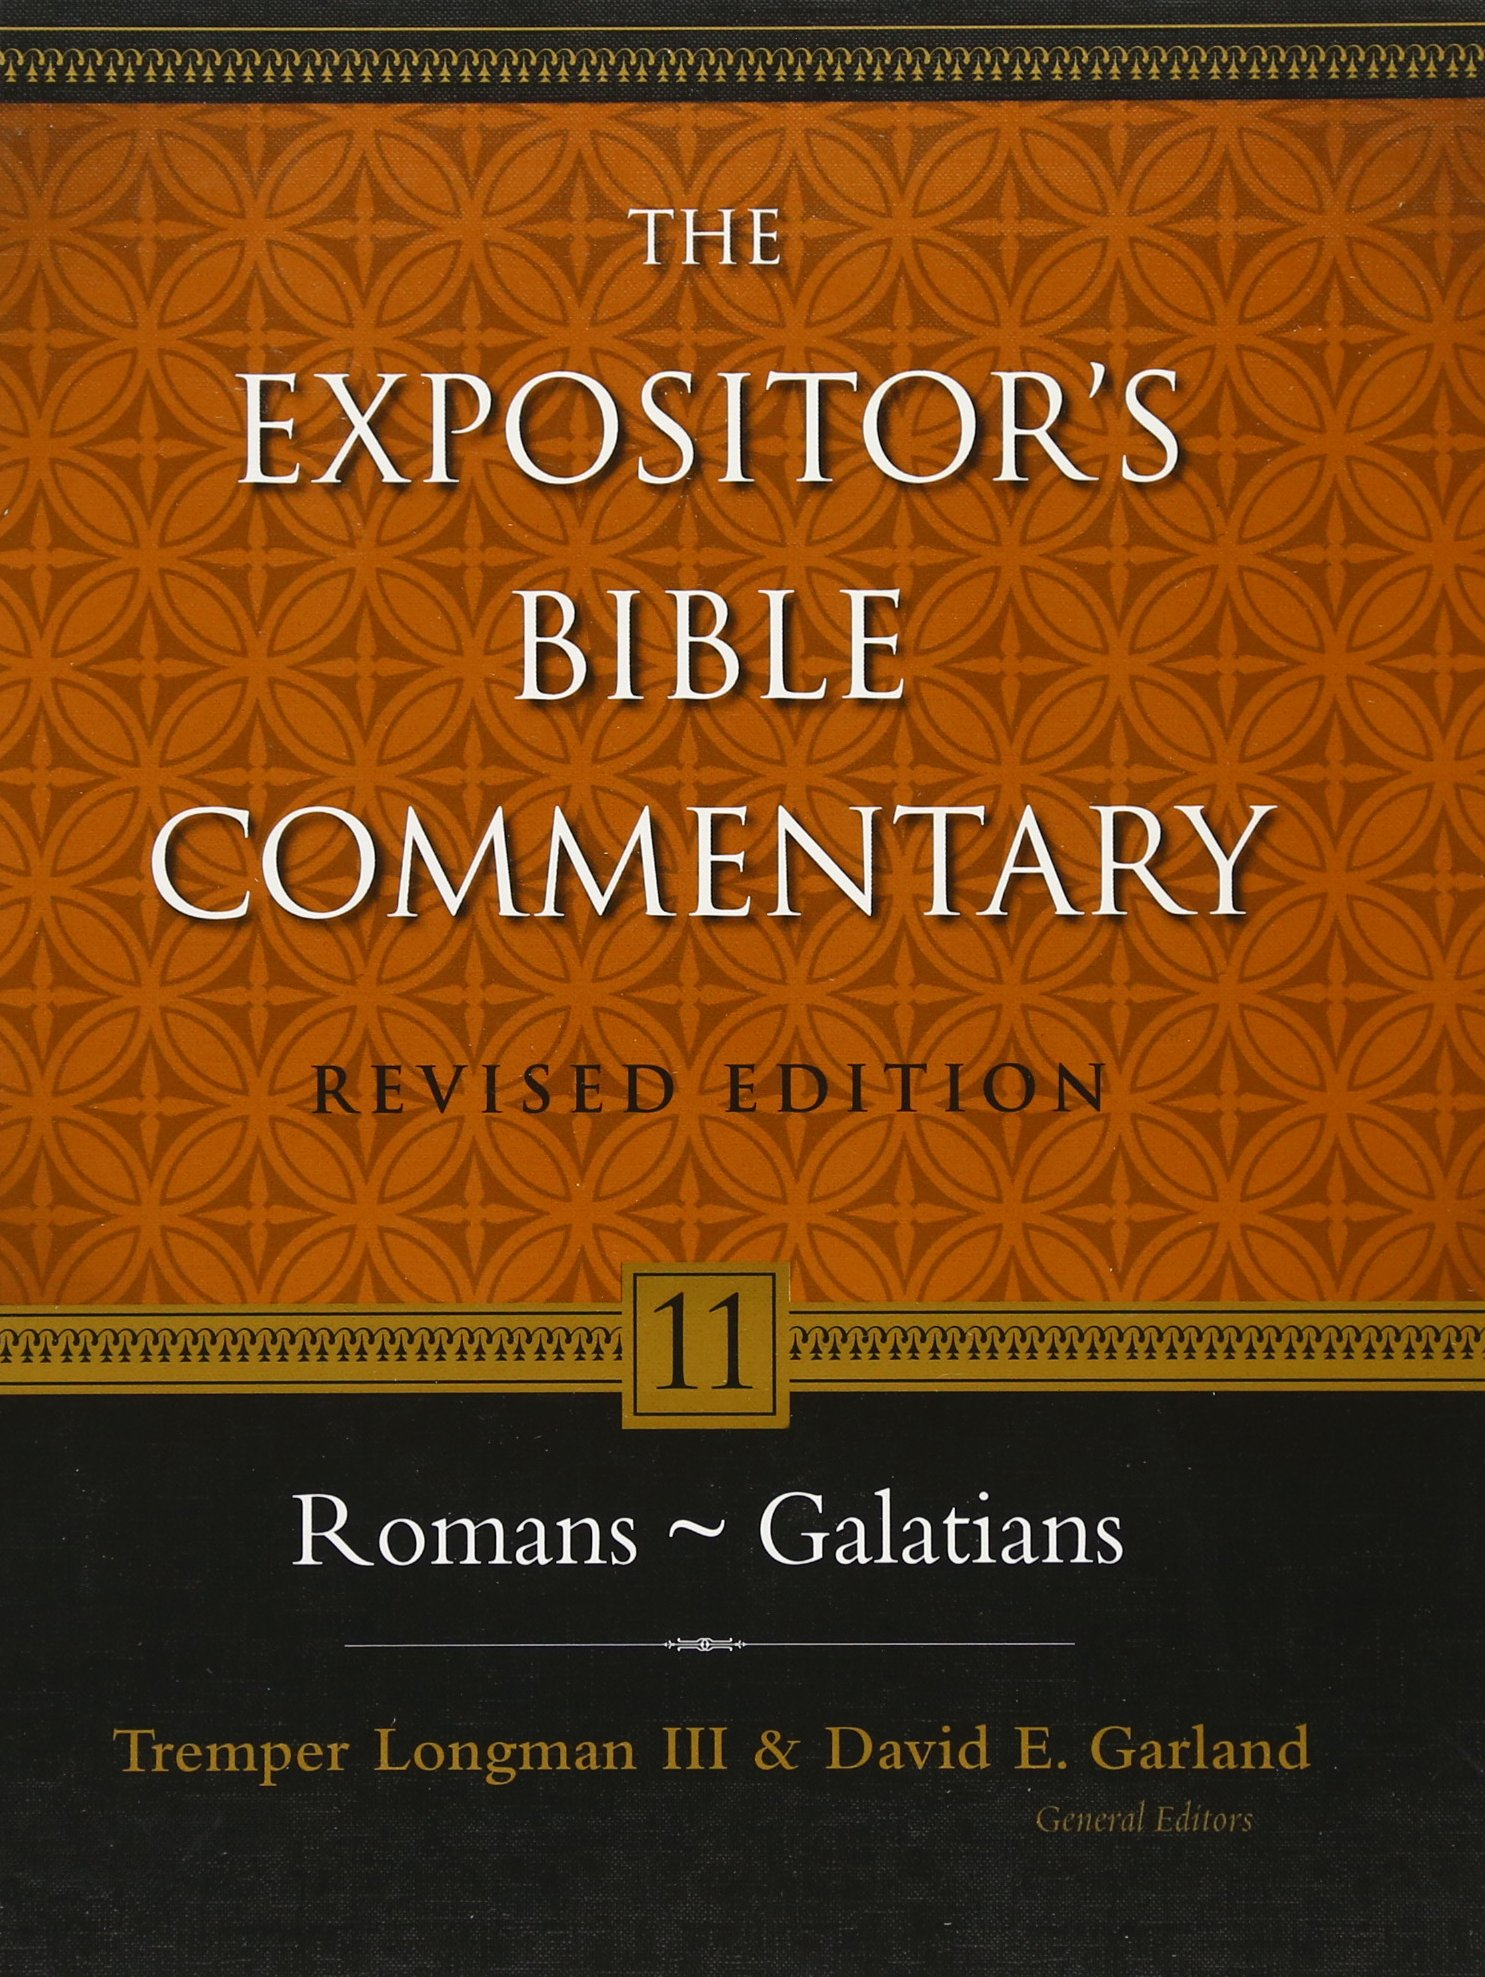 Romans - Galatians (The Expositor's Bible Commentary): Zondervan, Tremper  Longman III, David E. Garland, Everett F. Harrison, Donald A. Hagner, ...